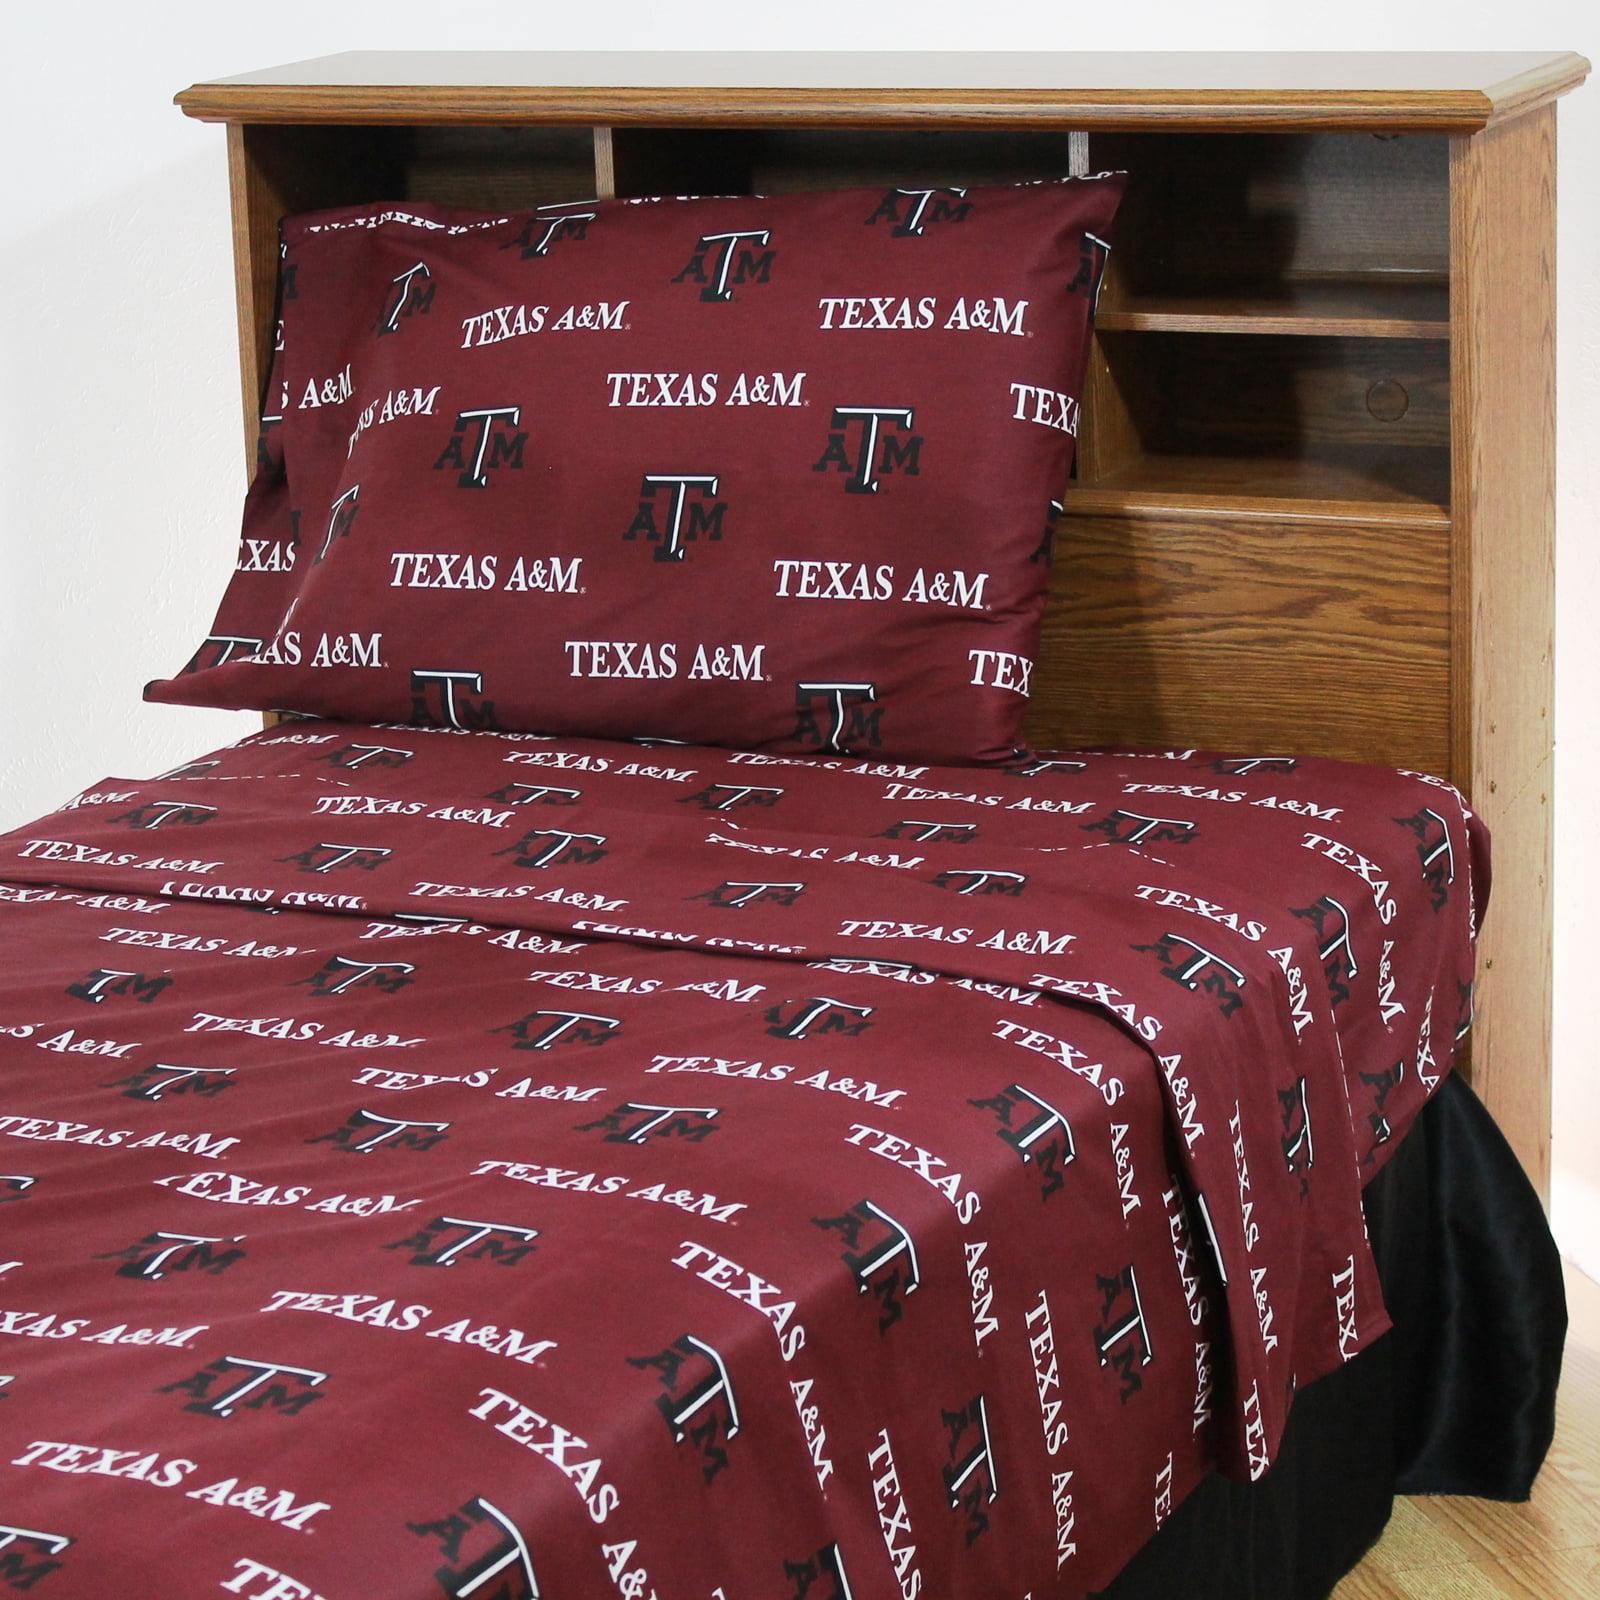 Texas A&M Aggies 100% cotton, 4 piece sheet set - flat sheet, fitted sheet, 2 pillow cases, Full, Team Colors